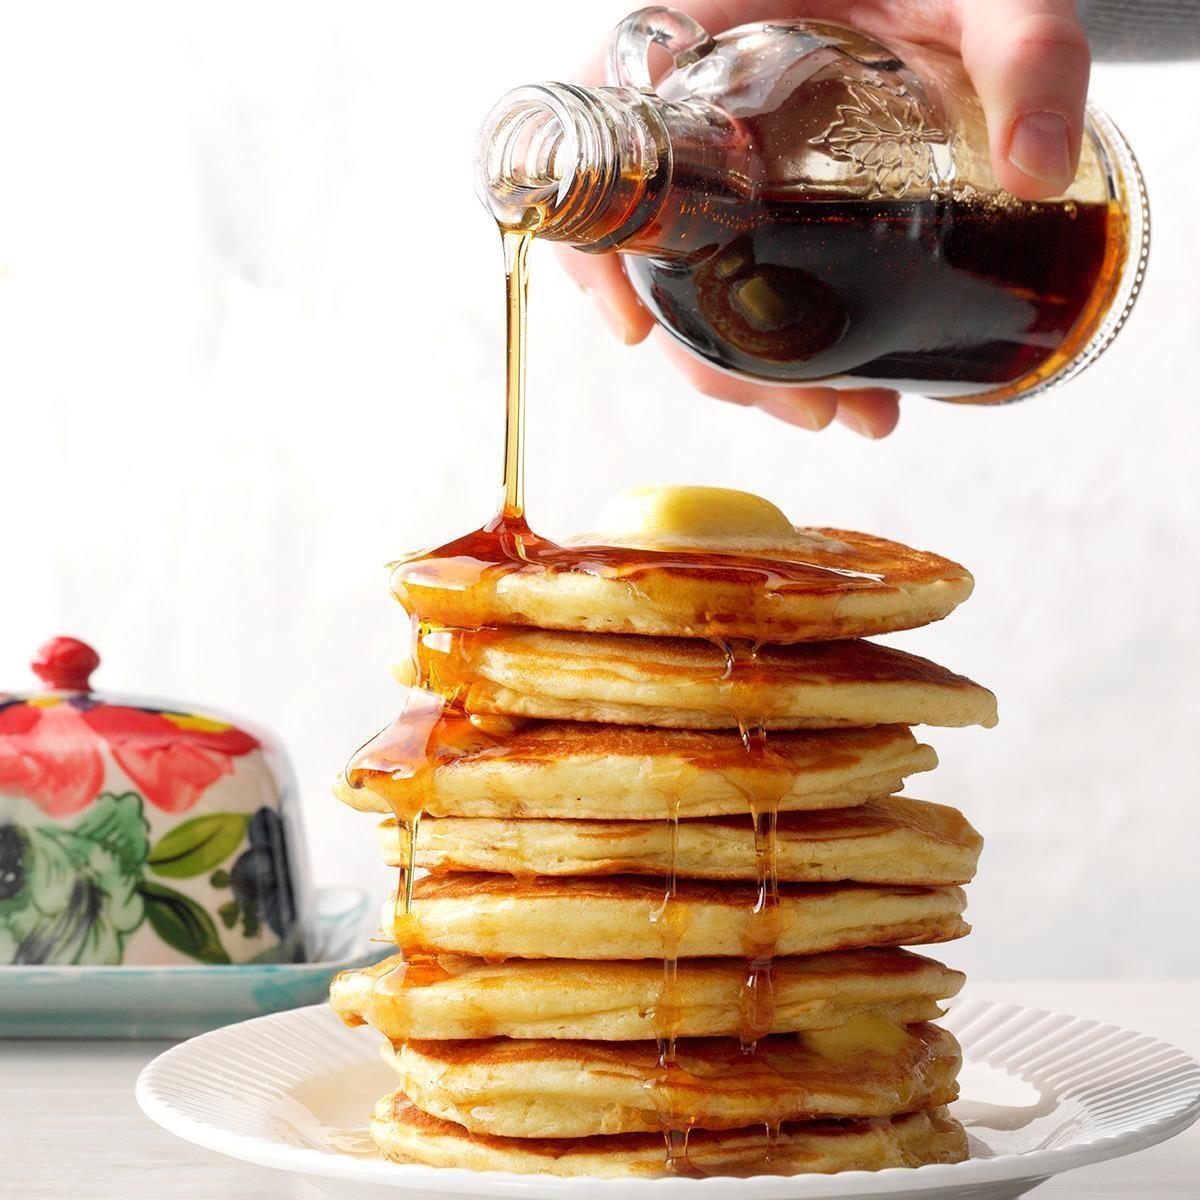 1950s: Pancakes